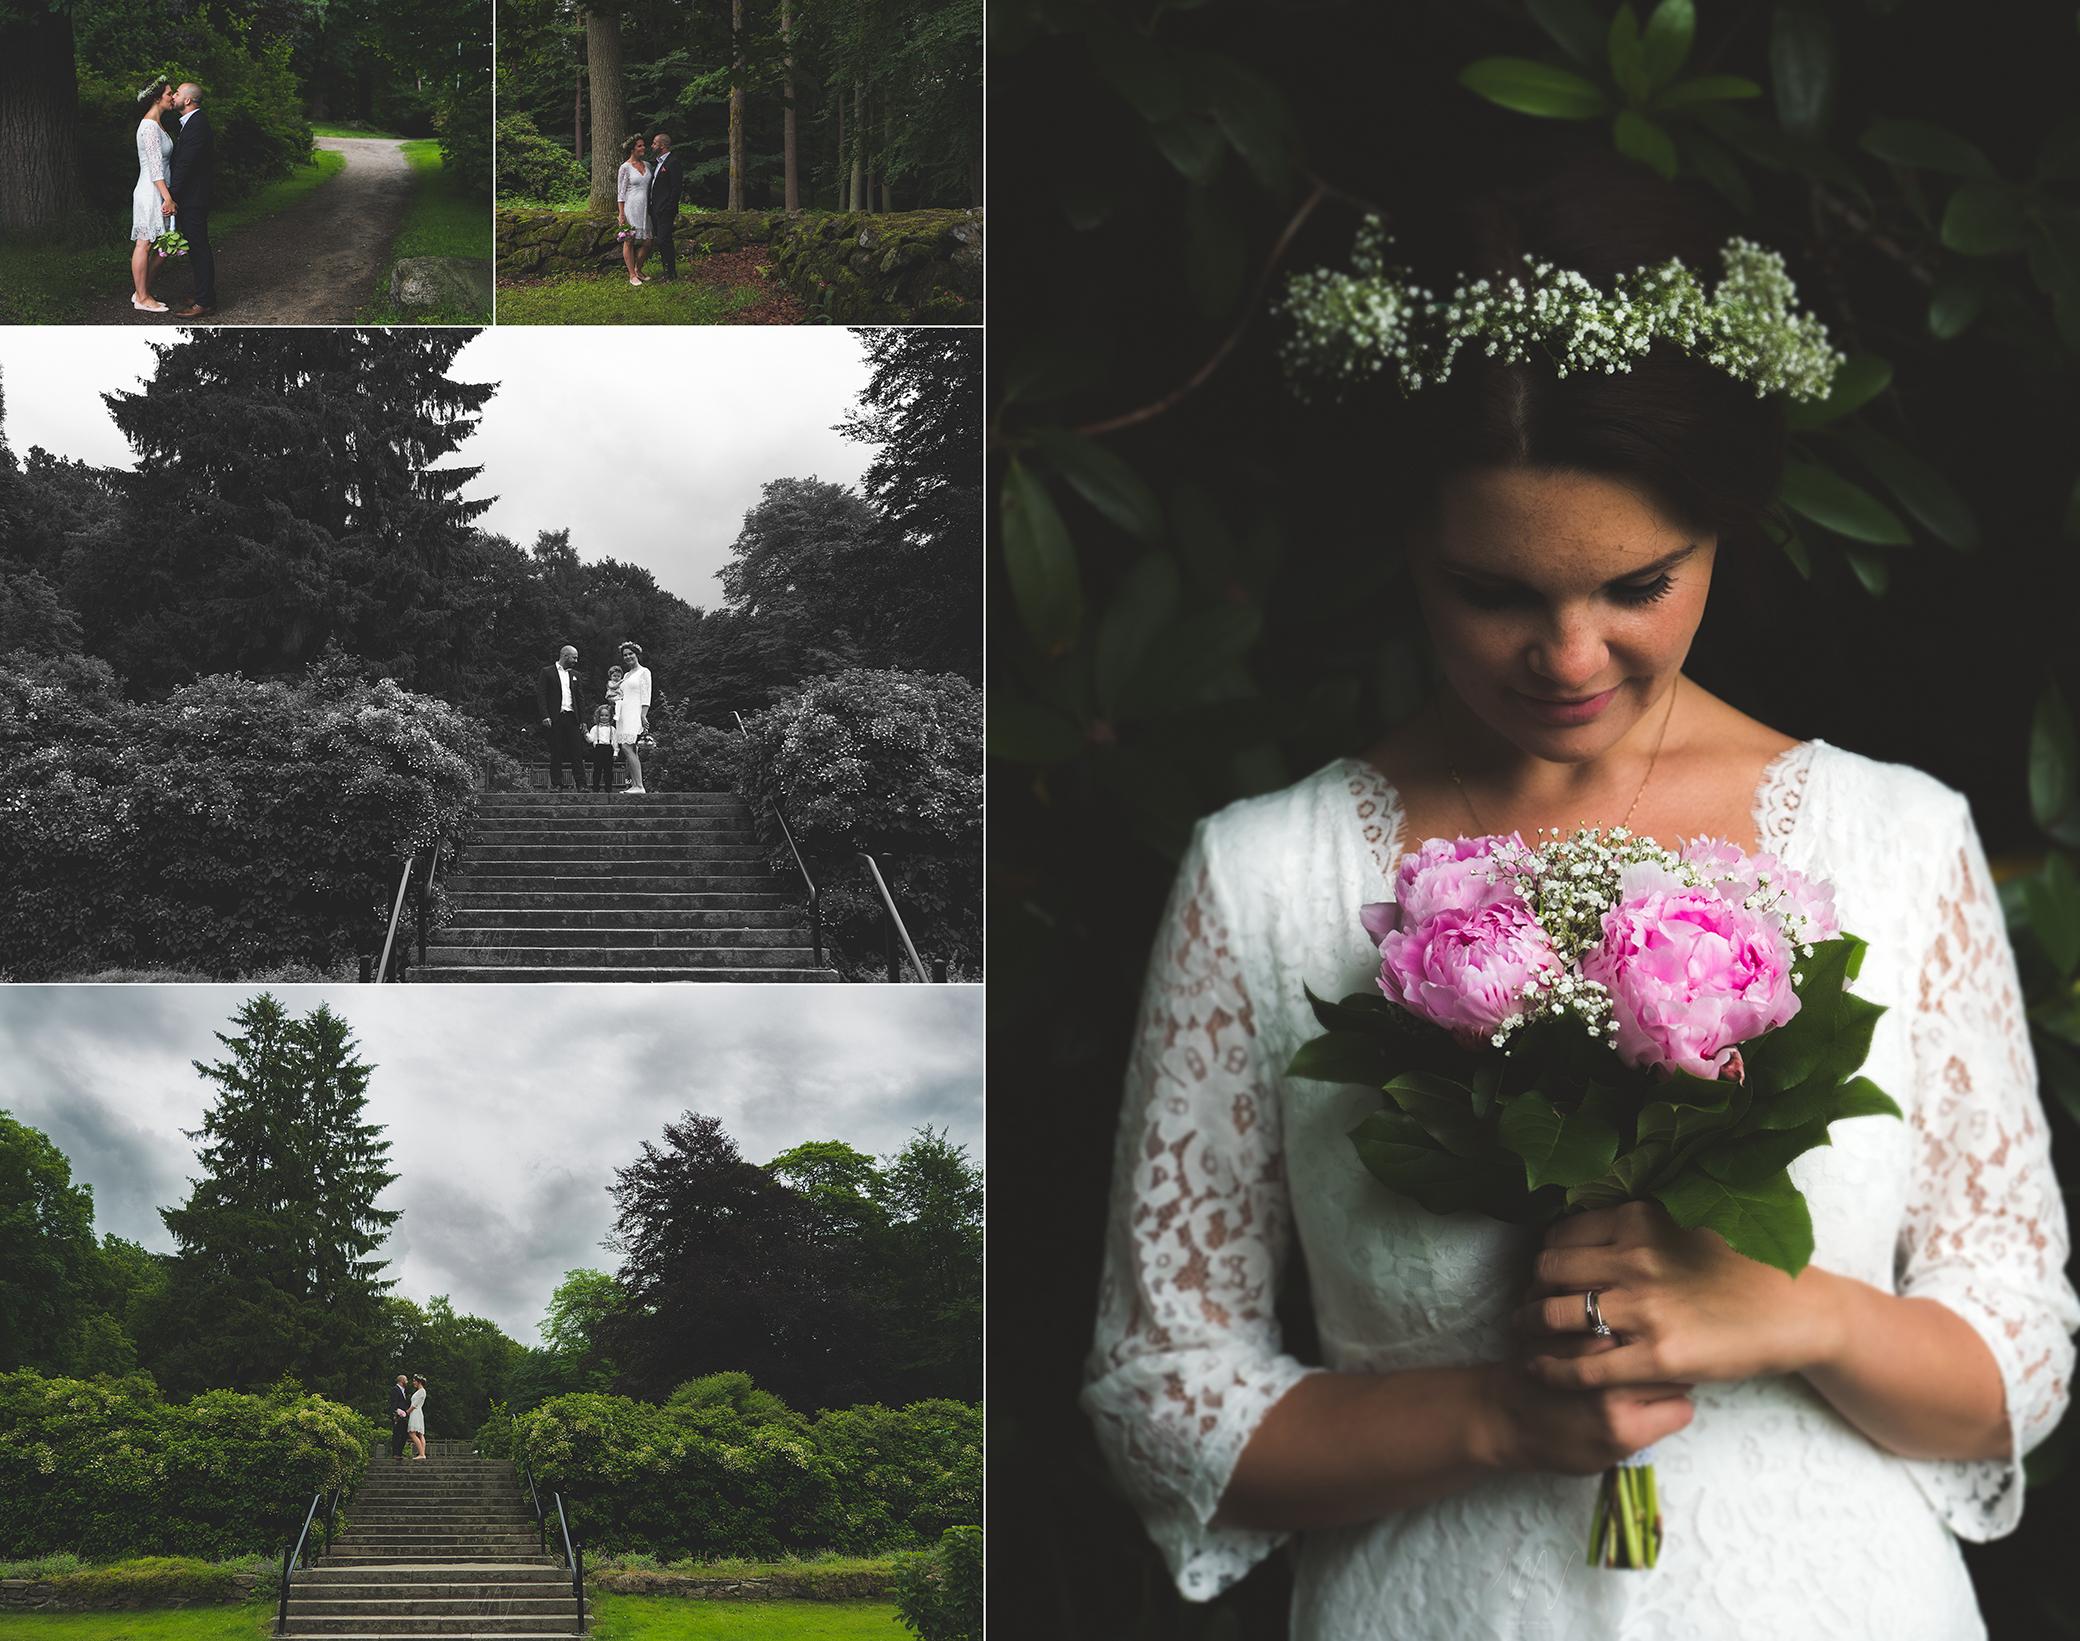 bröllopsfoto_maxnorin_borås-18 kopiera.jpg